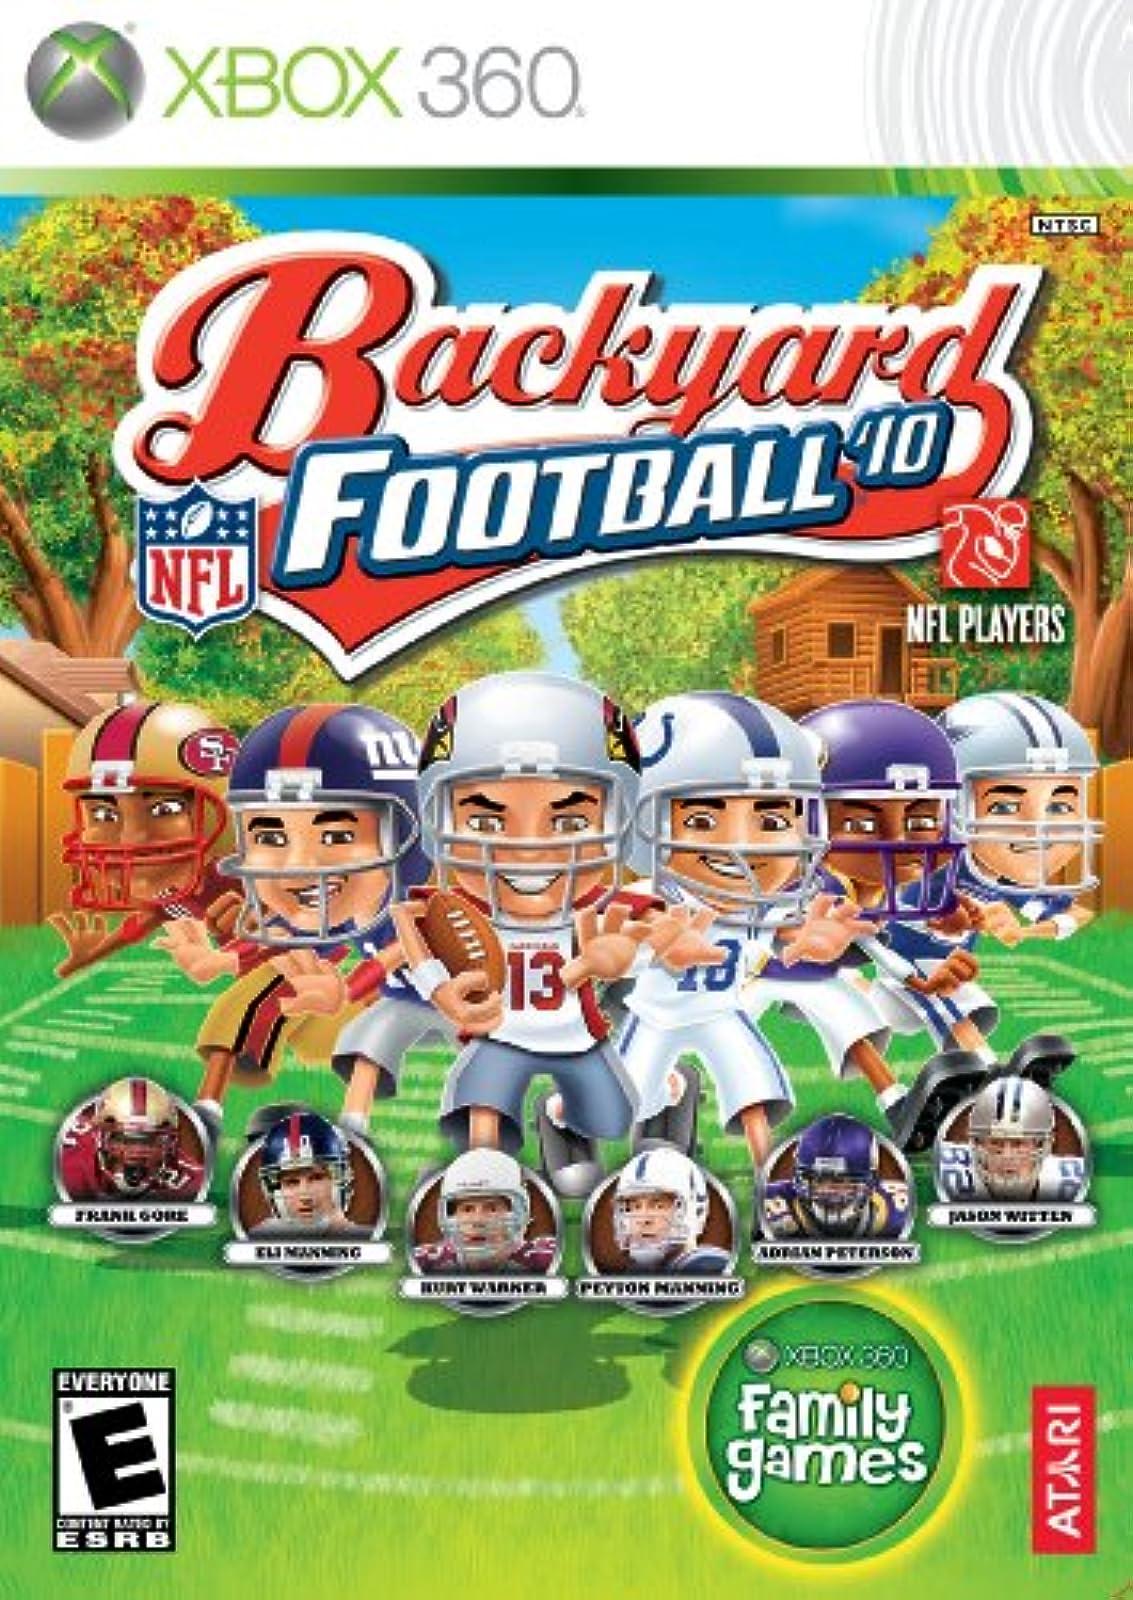 Backyard Football 2010 For Xbox 360